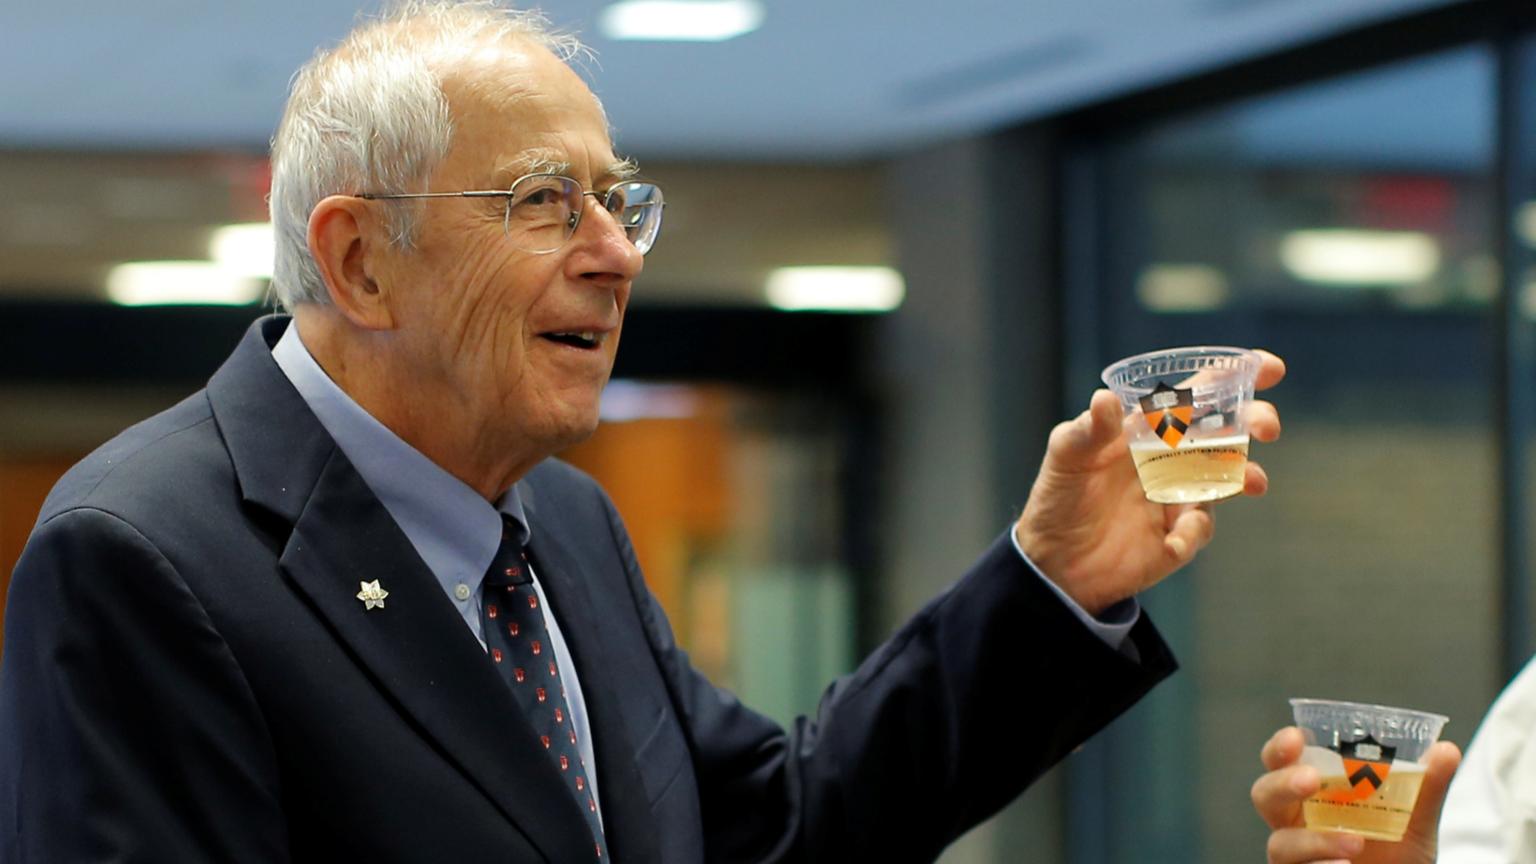 James Peebles, Canadian-Born Scientist, Wins Nobel Prize In Physics